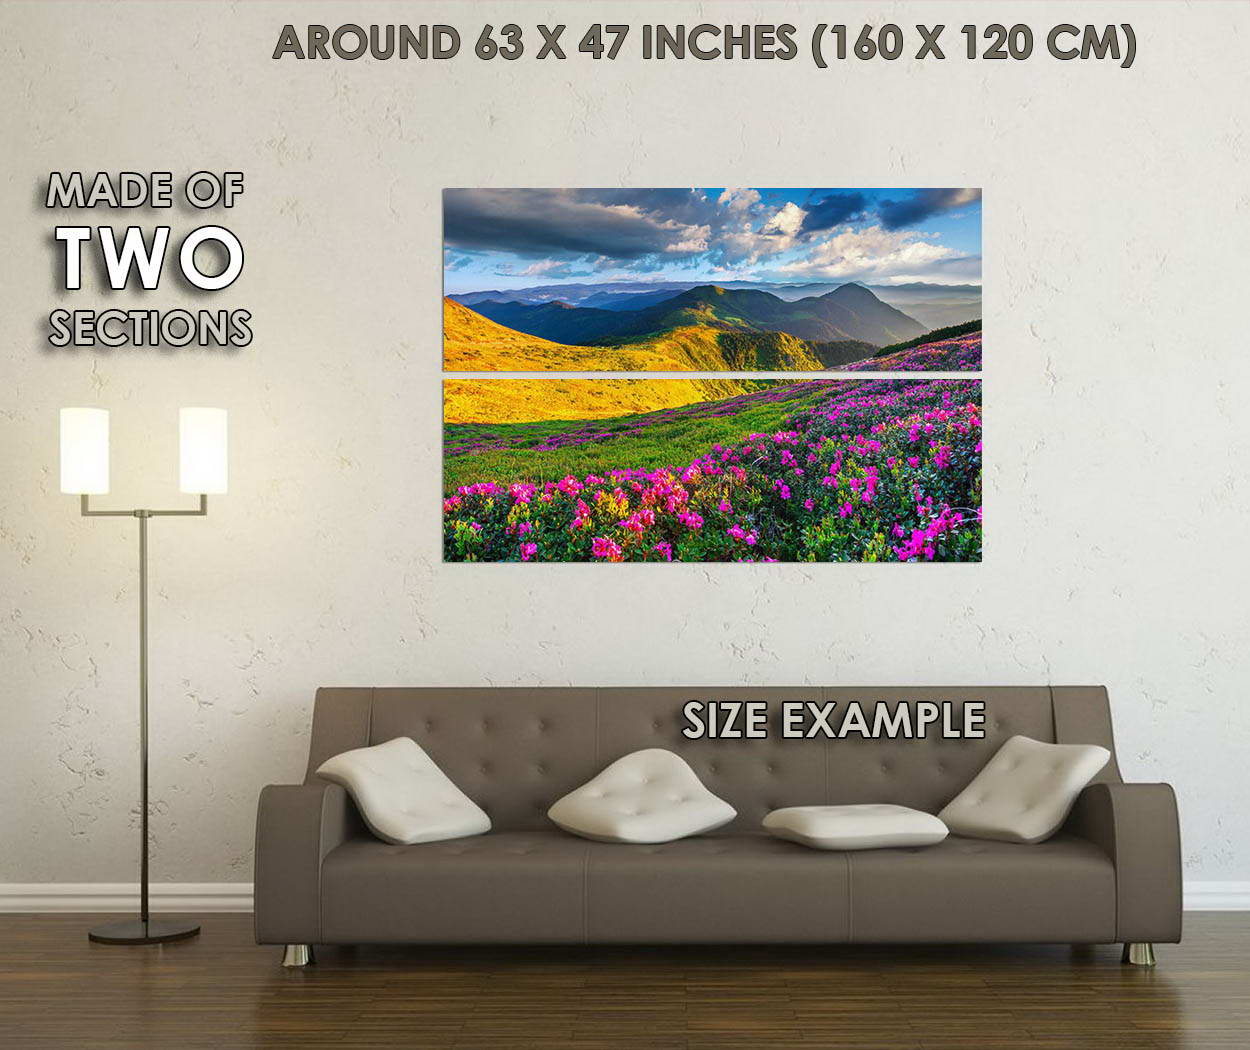 10671-Azalea-Mountains-Flowers-Nature-LAMINATED-POSTER-CA thumbnail 6